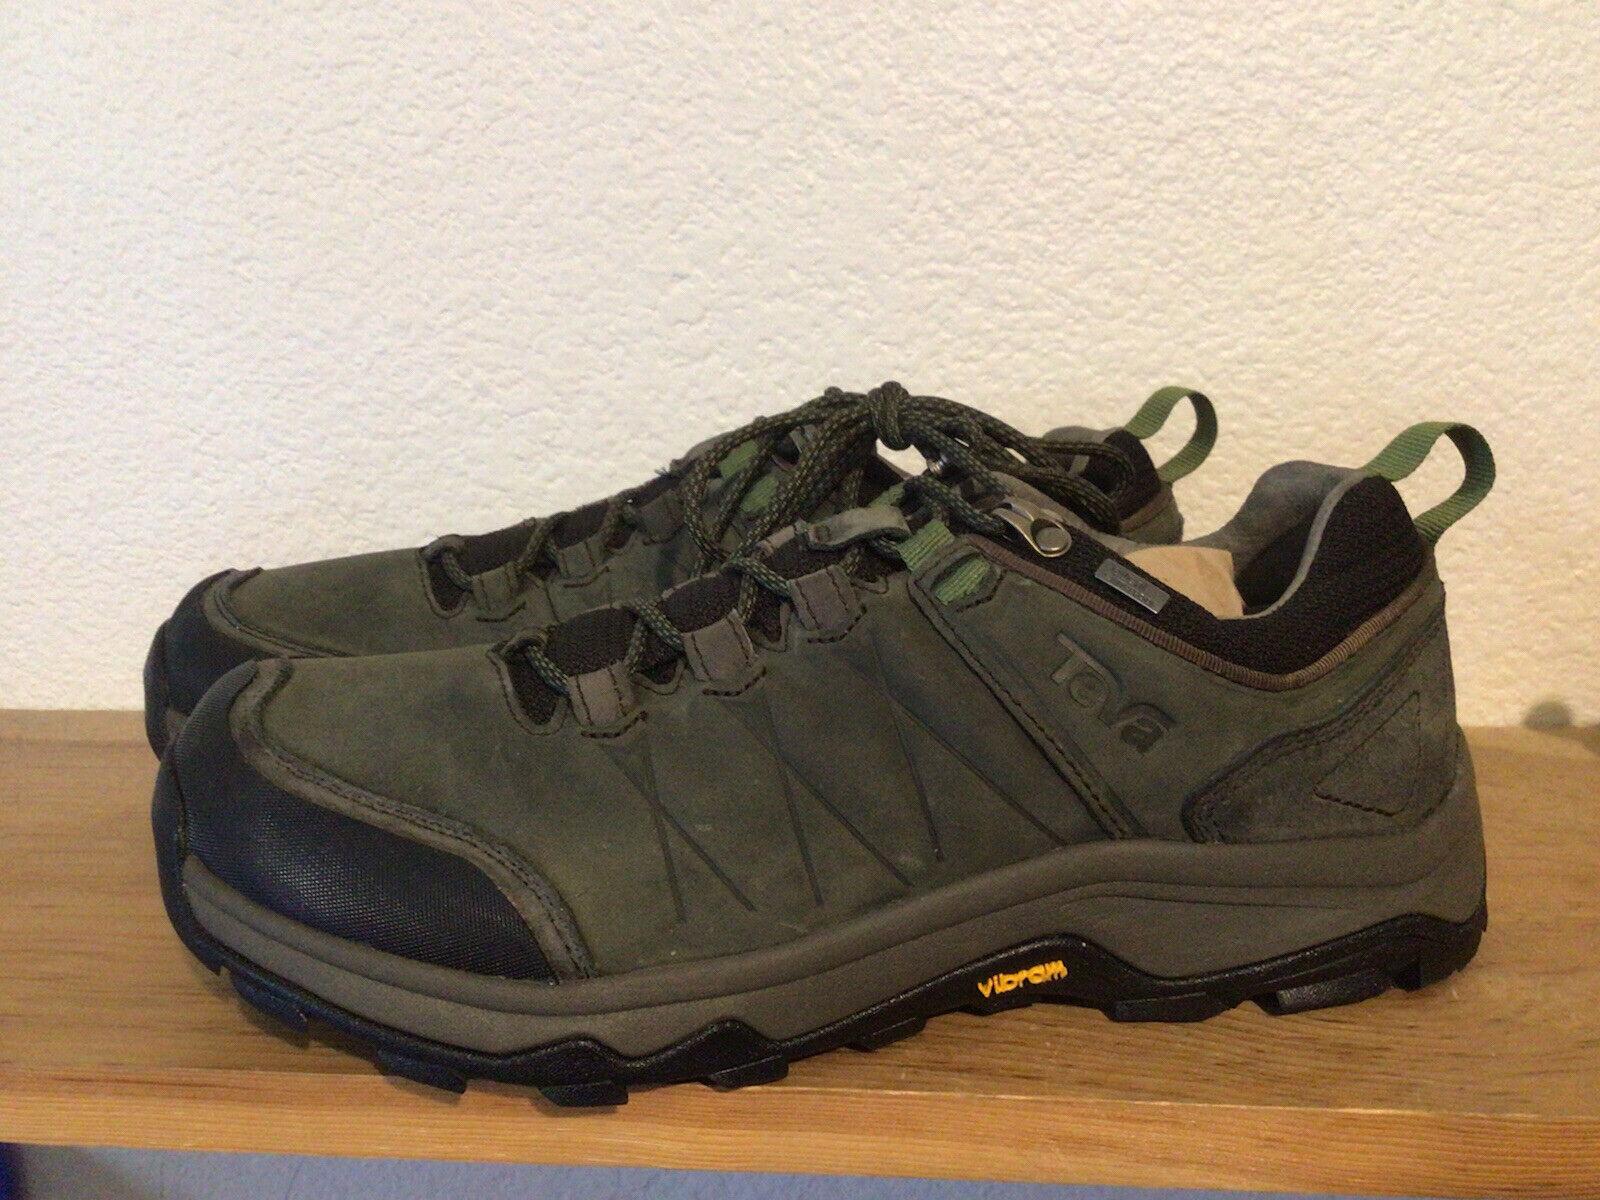 Men's Teva Arrowood Black Olive Trail Hiking Shoes Size 9.5 Waterproof Vibram